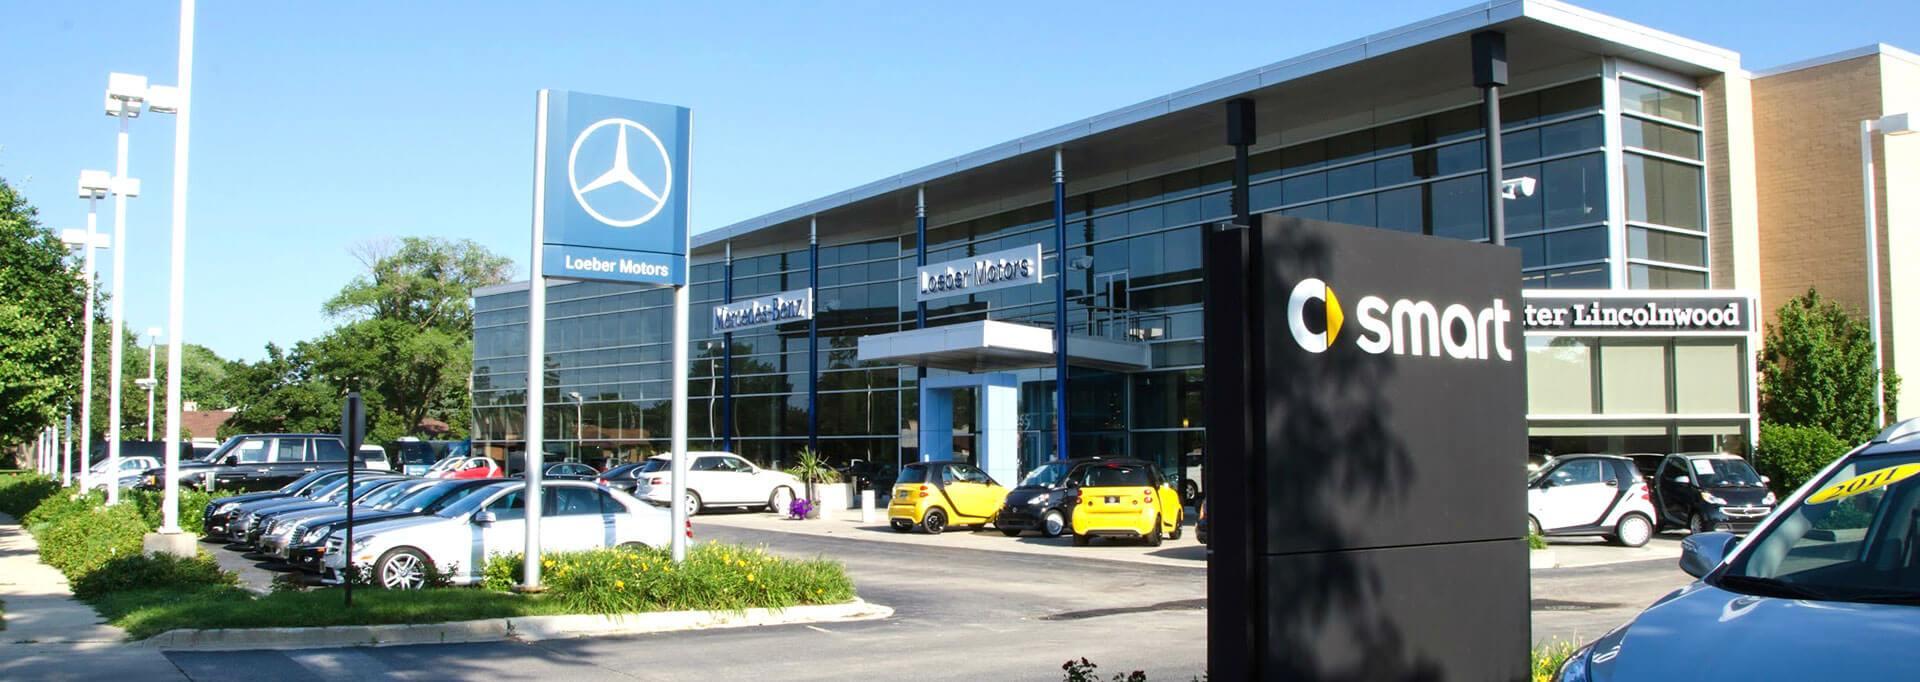 Loeber Motors, Lincolnwood IL